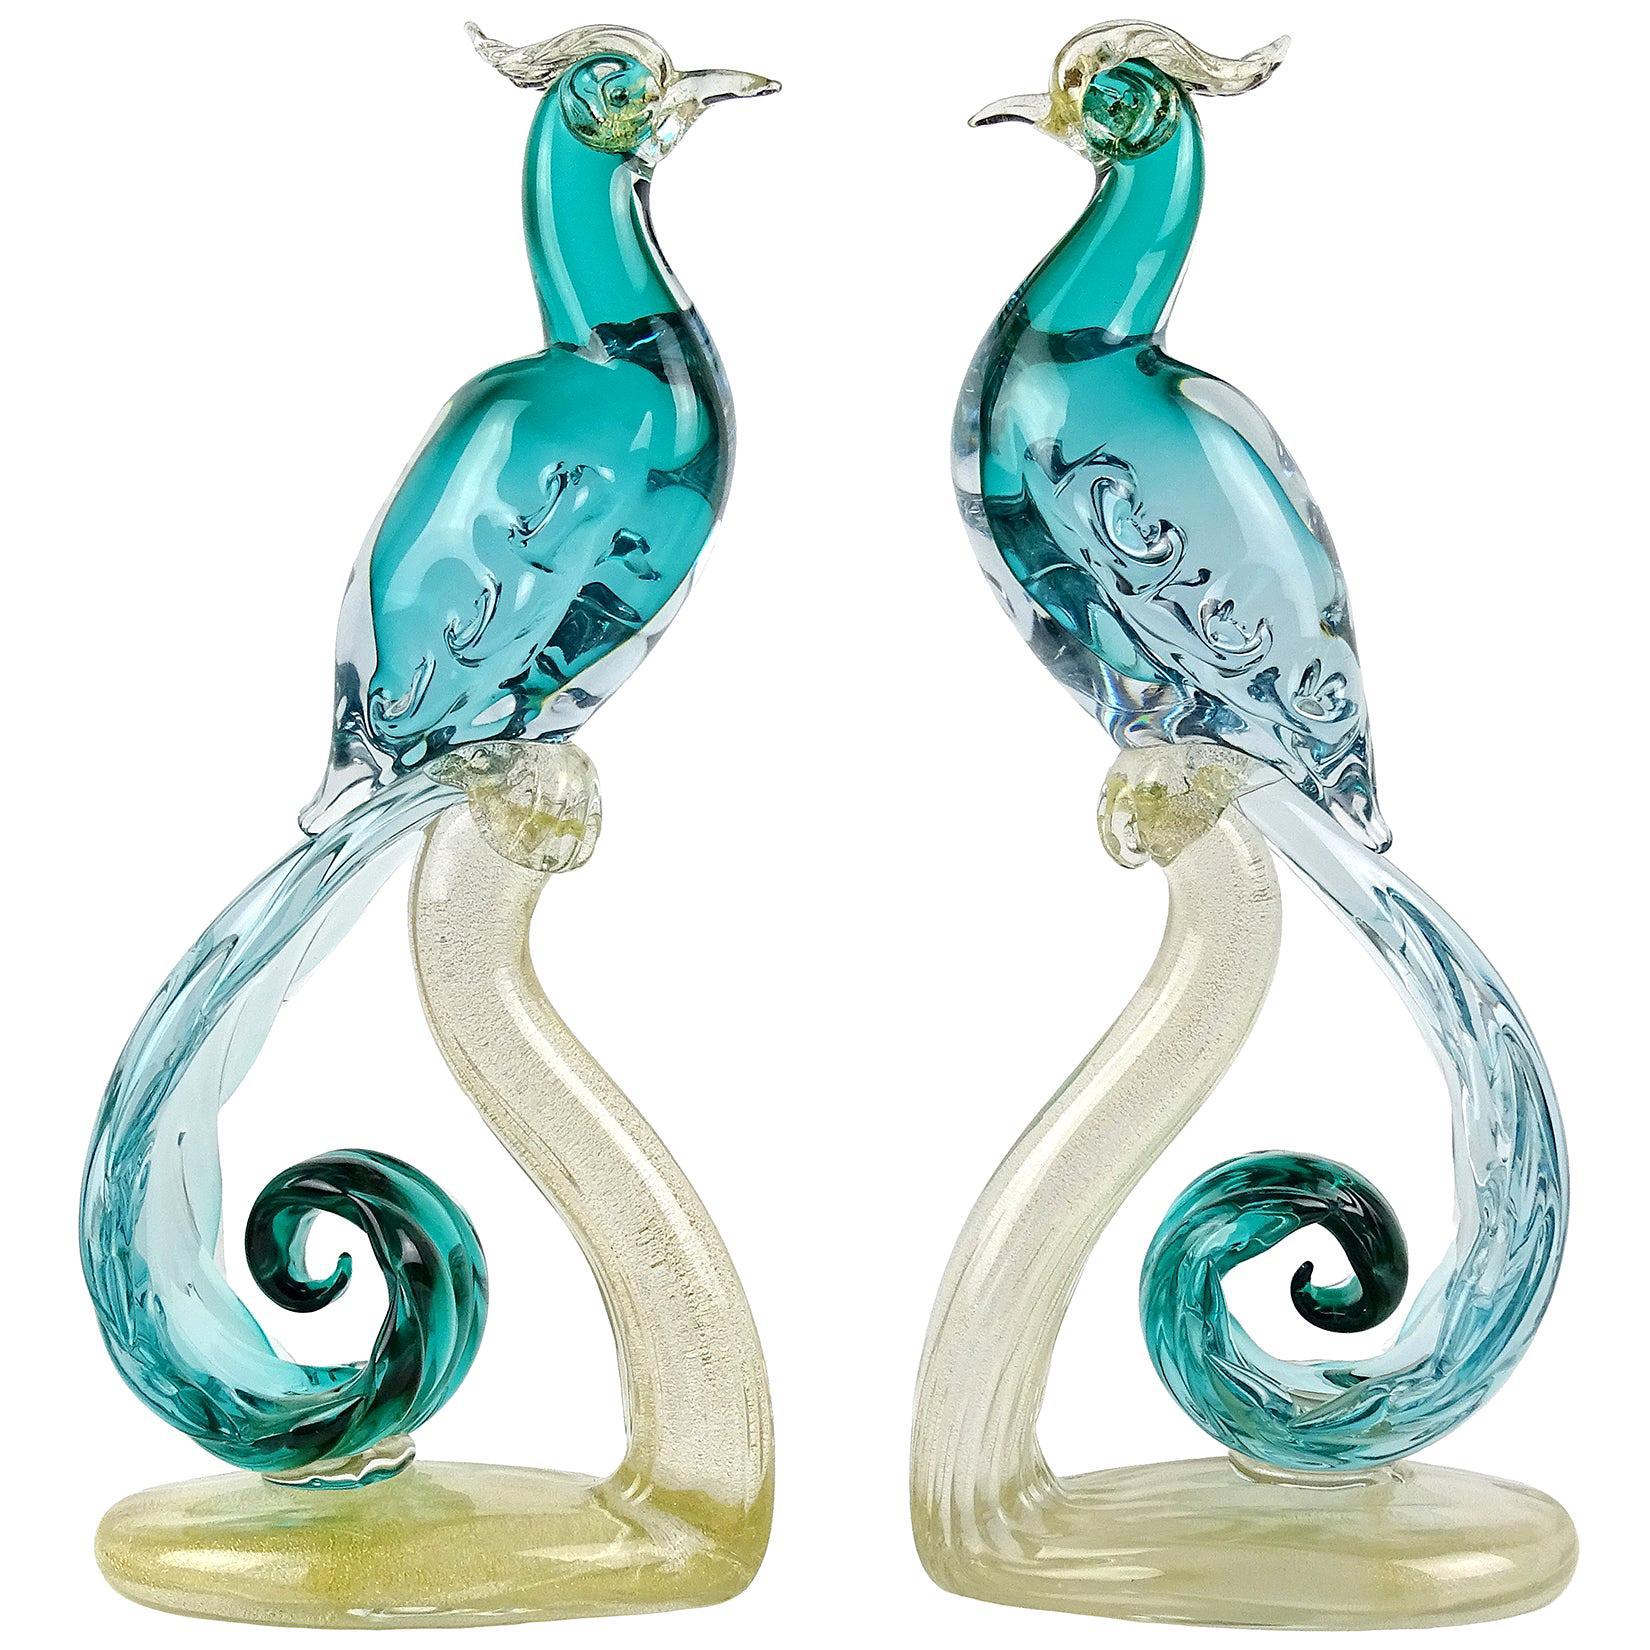 Barbini Murano Sommerso Aqua Gold Italian Art Glass Pheasant Bird Sculpture Set